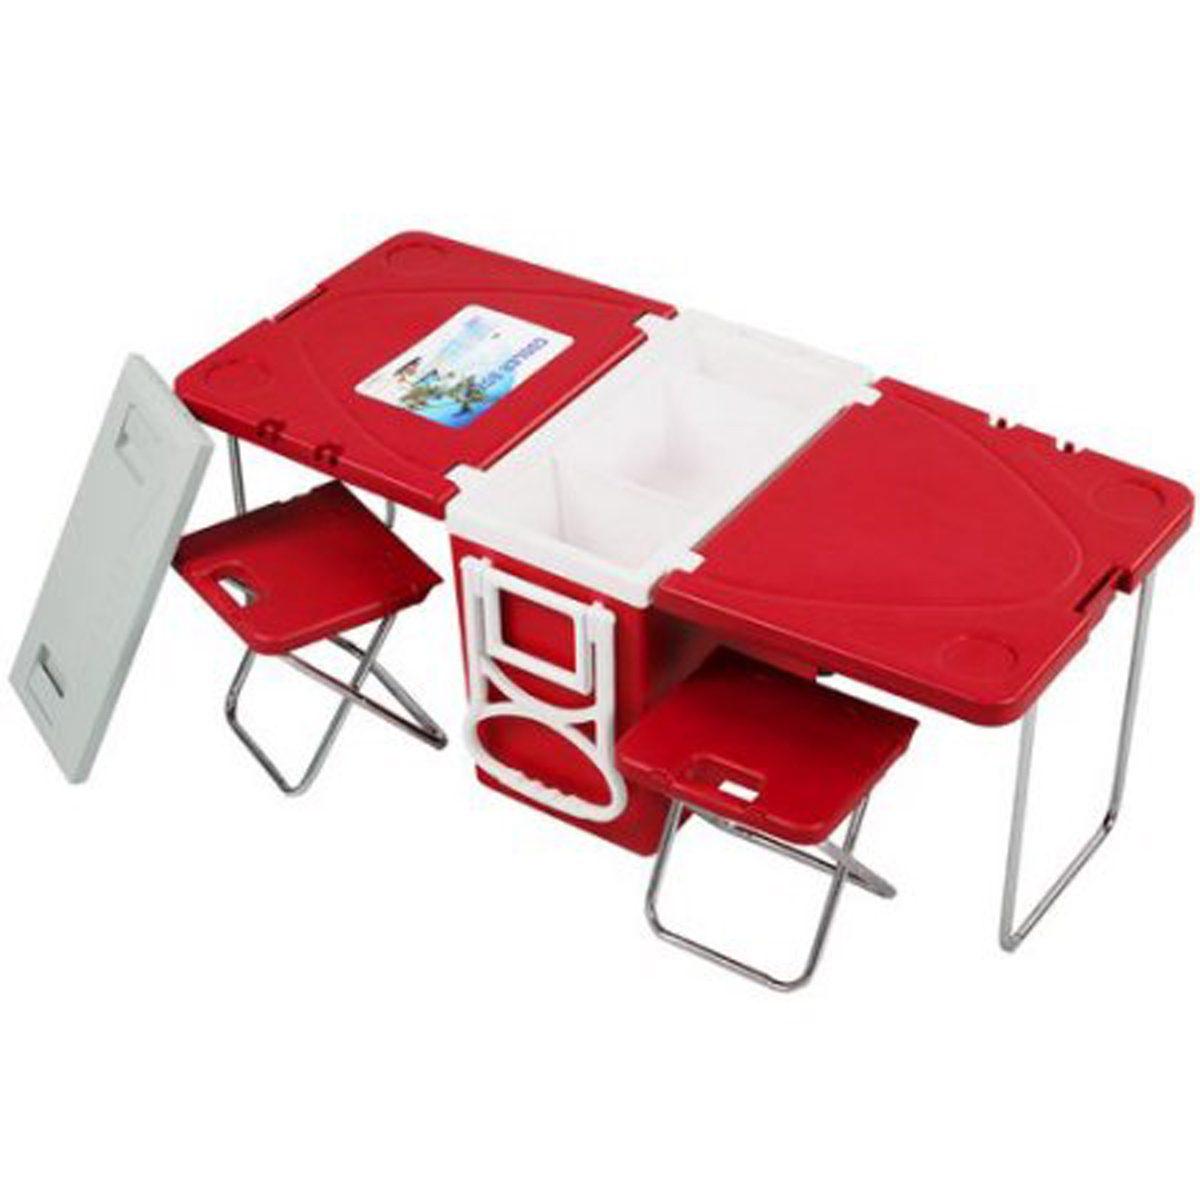 Walmart table